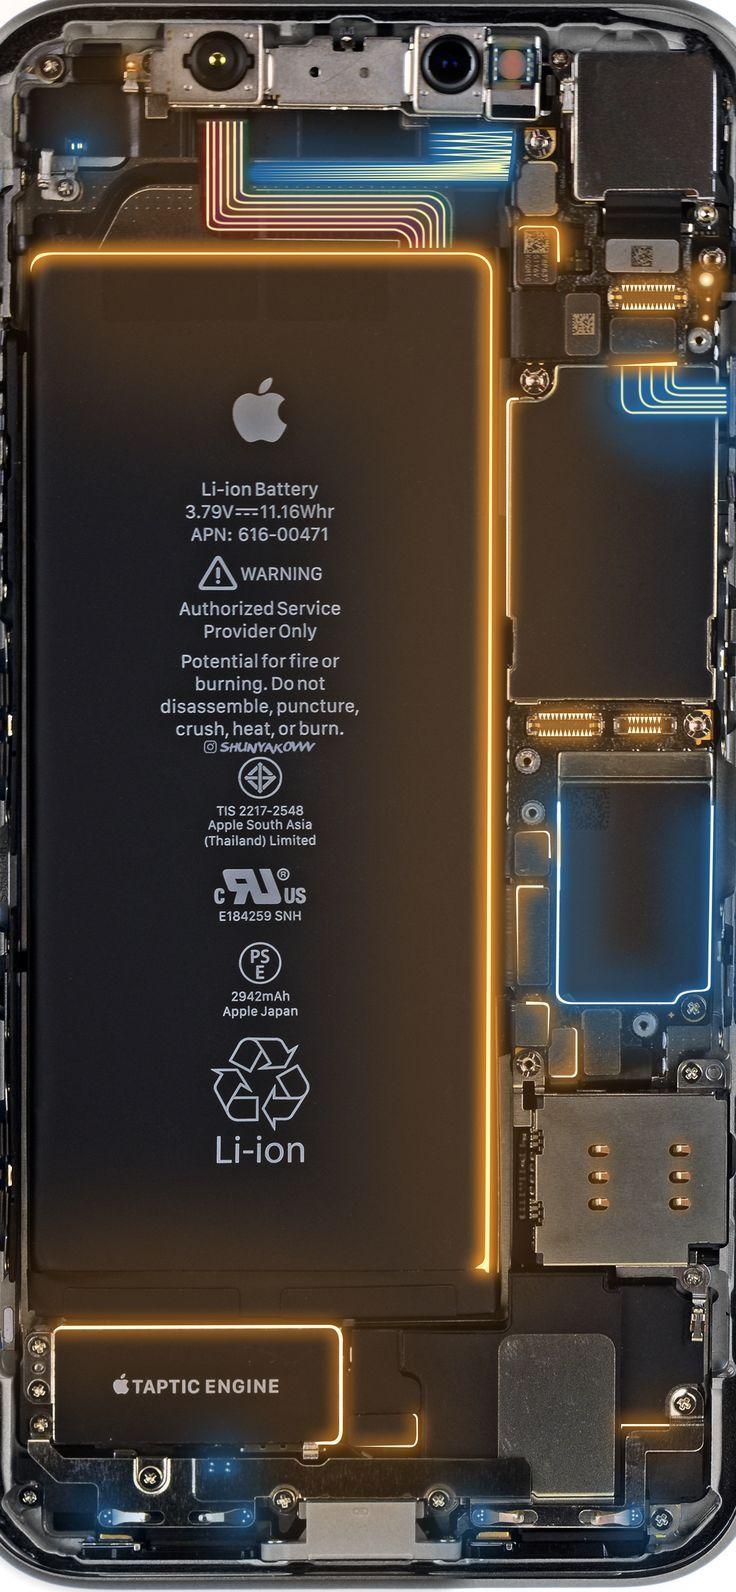 Iphone Xr Wallpapers Iphone Xr Trending Iphone Xr For Sales Iphonexr Iphone Iphon Apple Wallpaper Iphone Game Wallpaper Iphone Iphone Wallpaper Orange